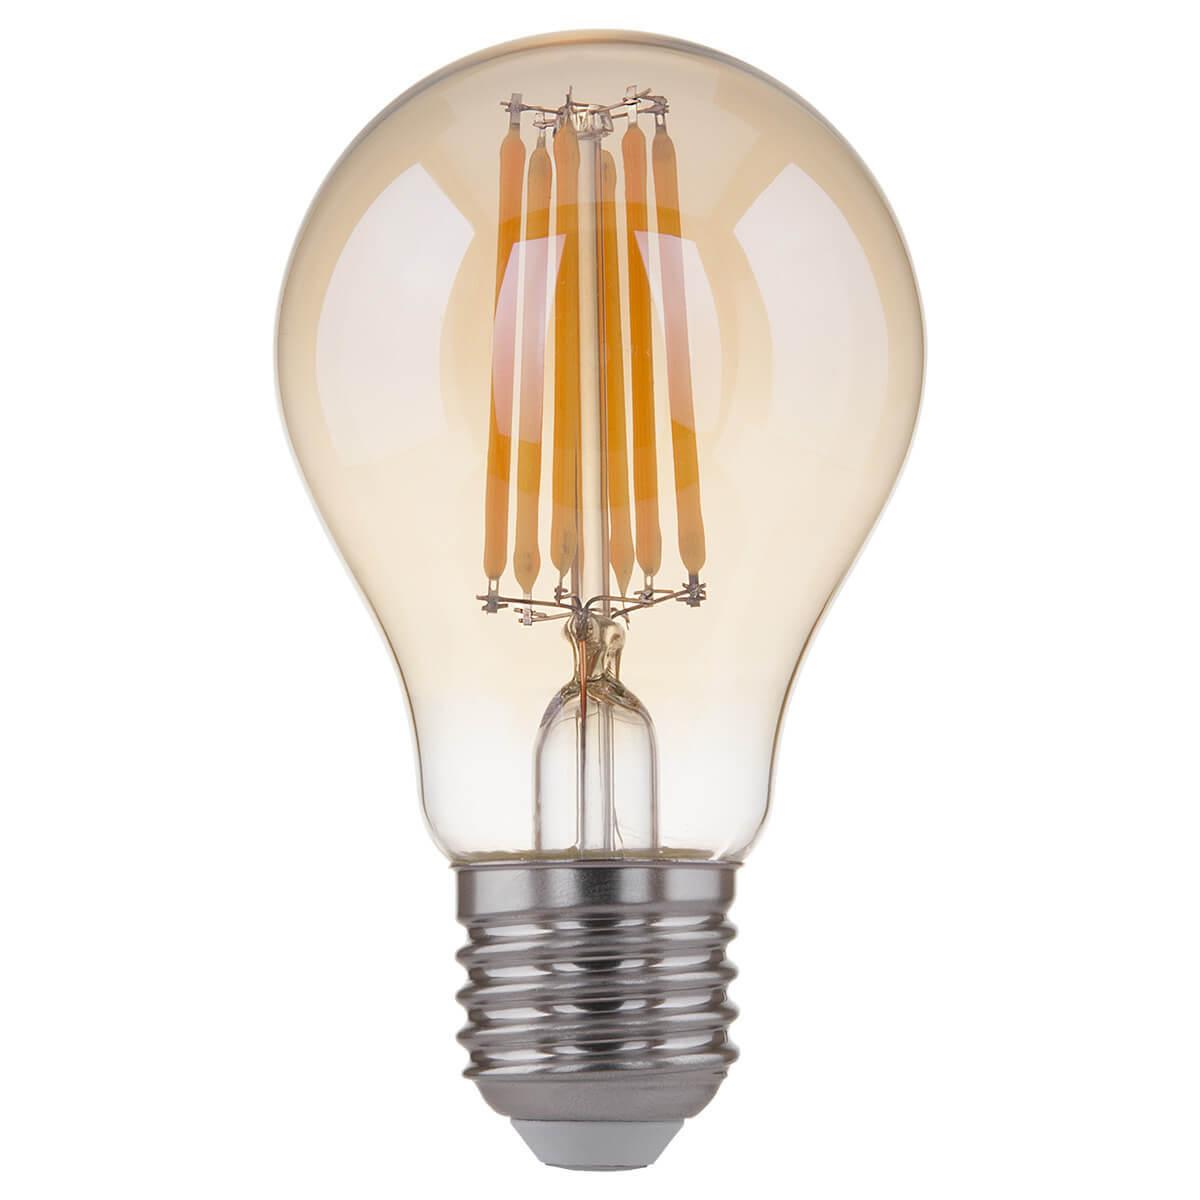 Лампа светодиодная филаментная Elektrostandard LED E27 12W 3300K 4690389108341